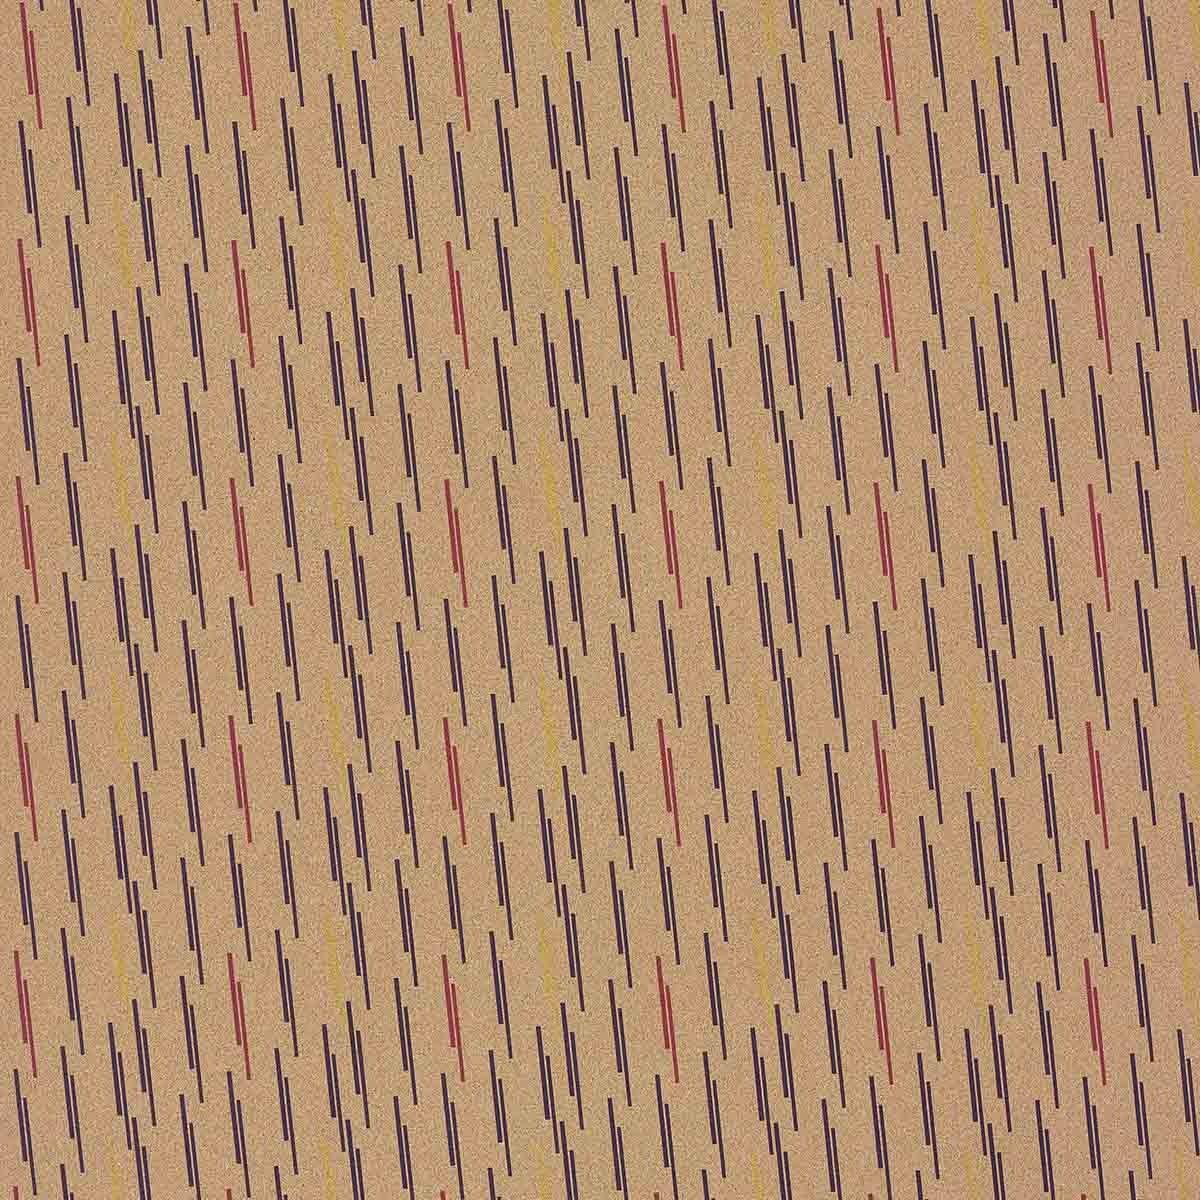 Decorative cork thin paper Iridescence 01.02